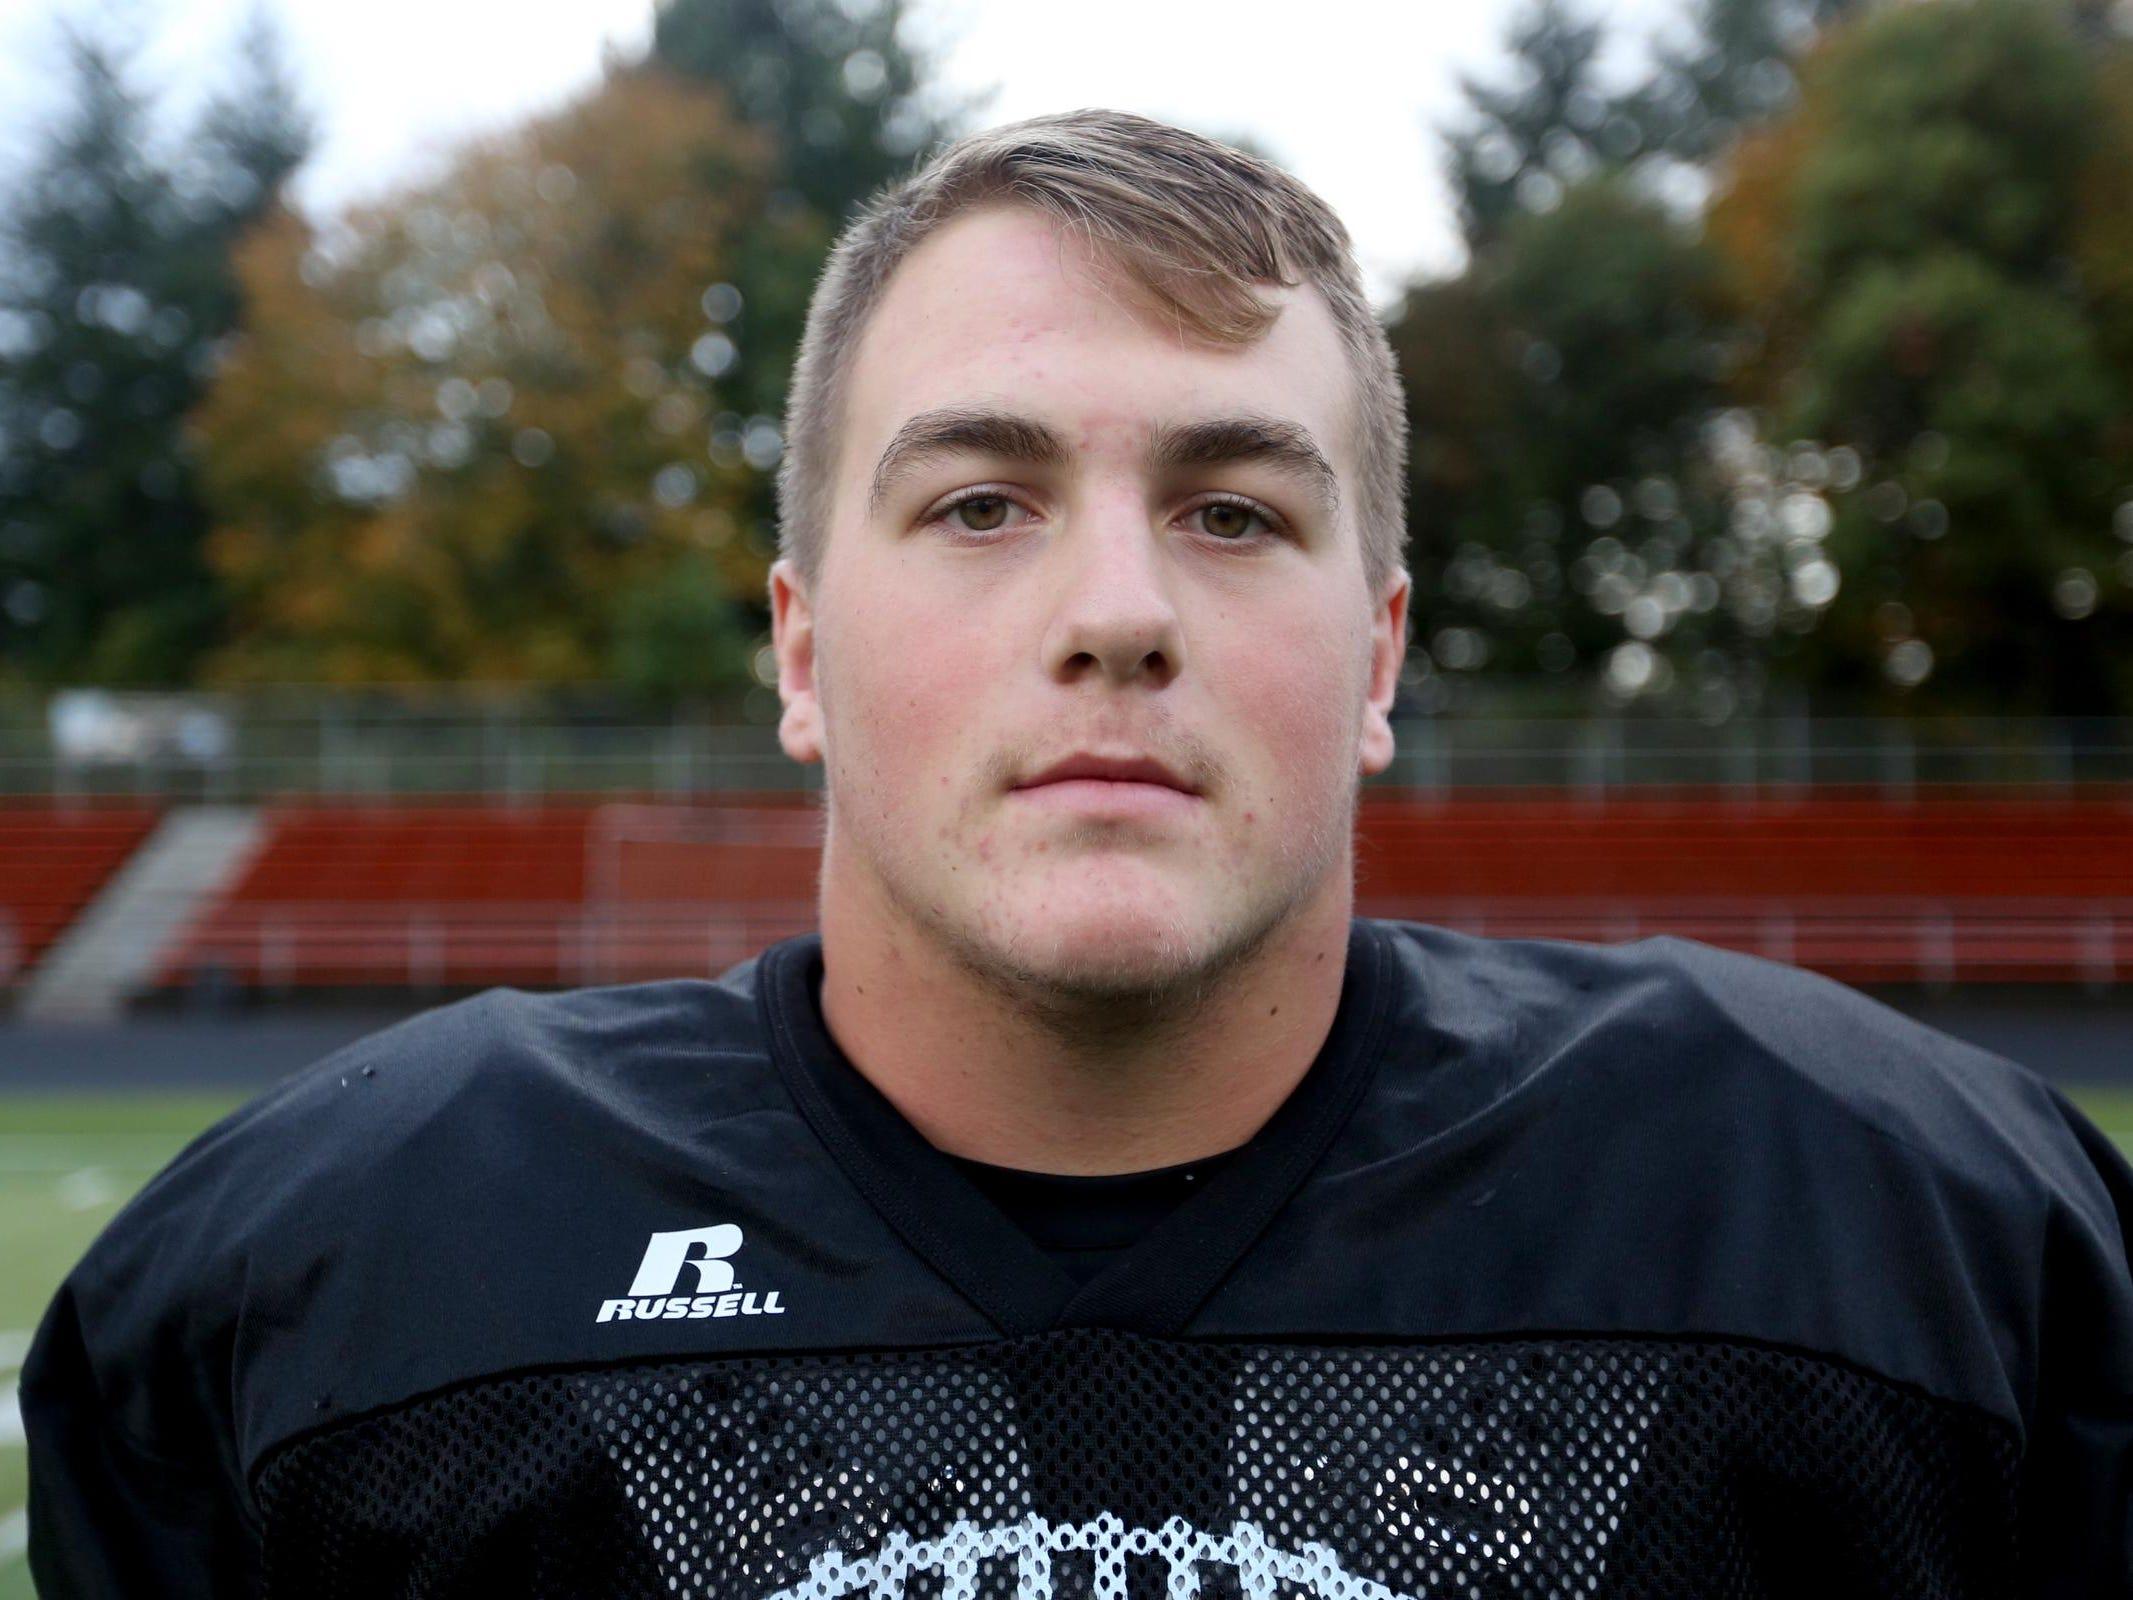 Senior Tanner Sorensen, of the Sprague High School football team, photographed on Wednesday, Oct. 5, 2016.